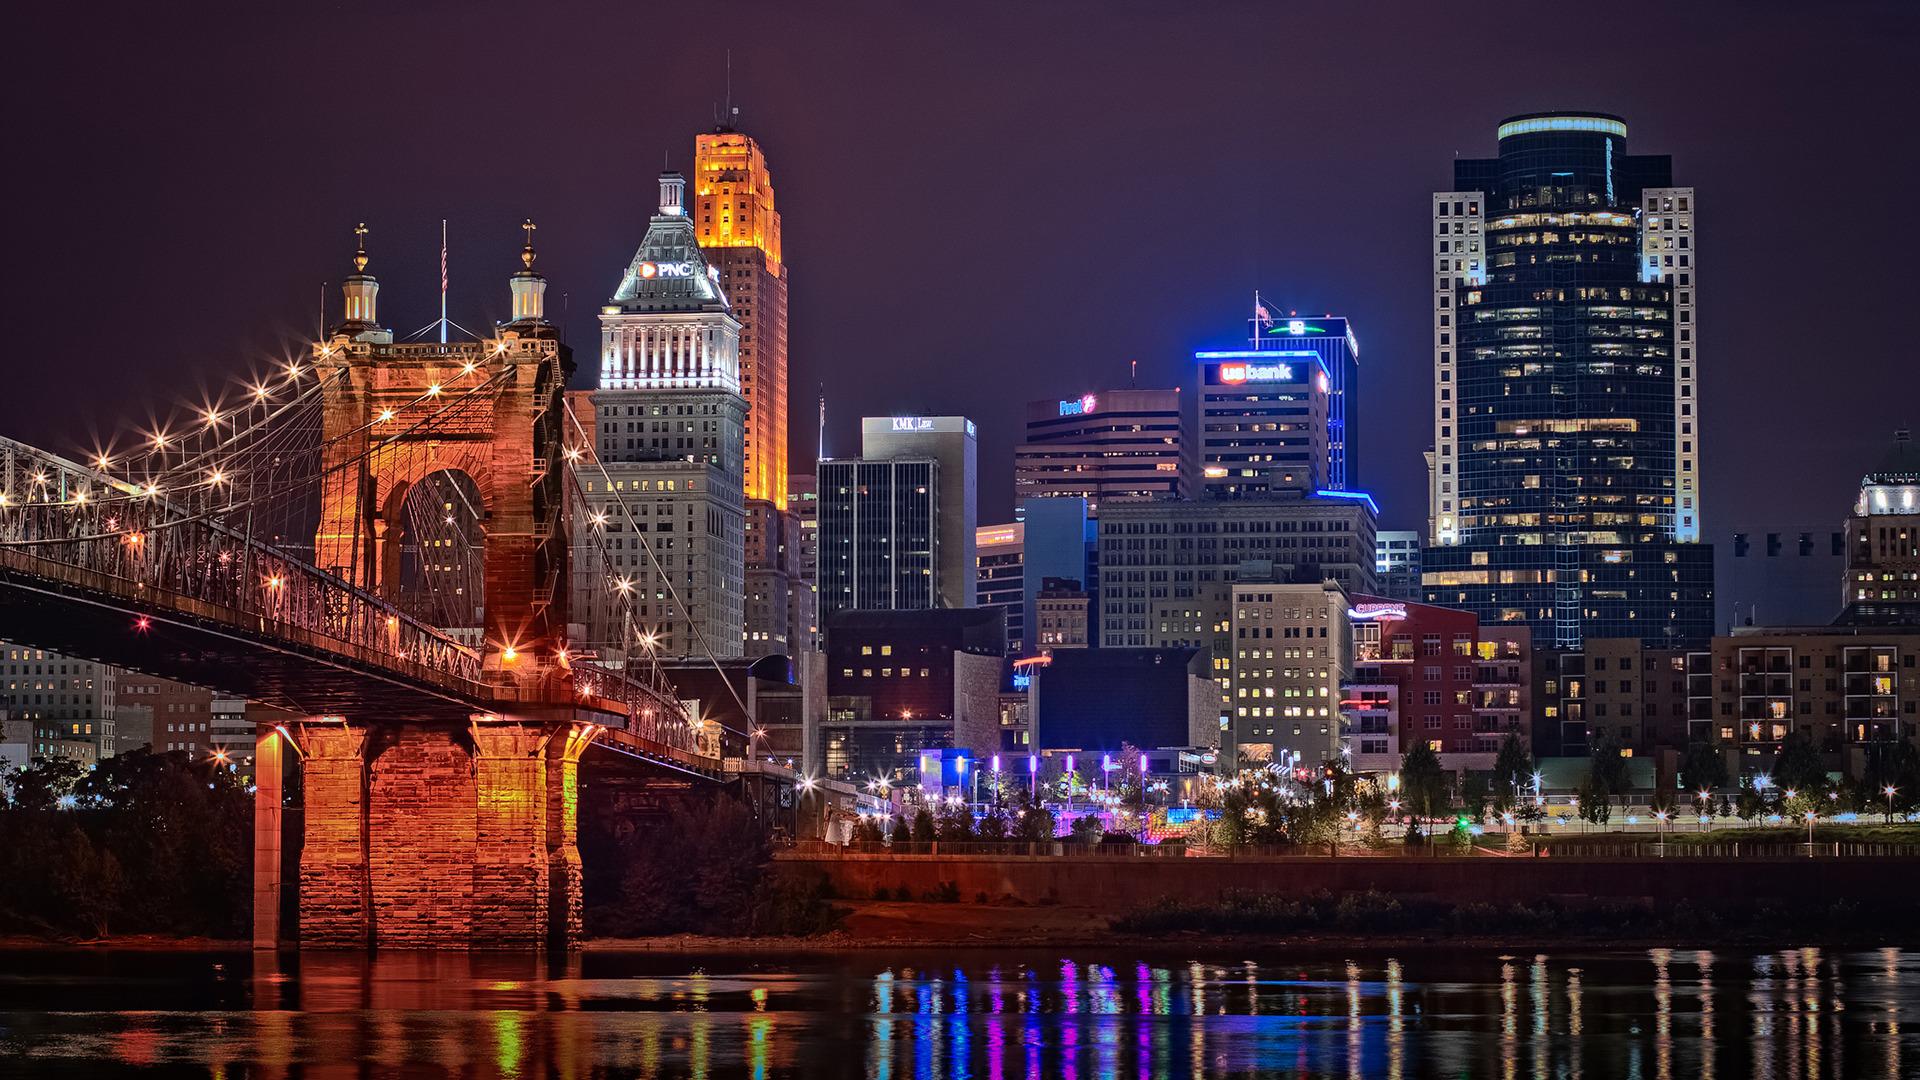 Cincinnati Ohio Wallpaper 9838 1920x1080